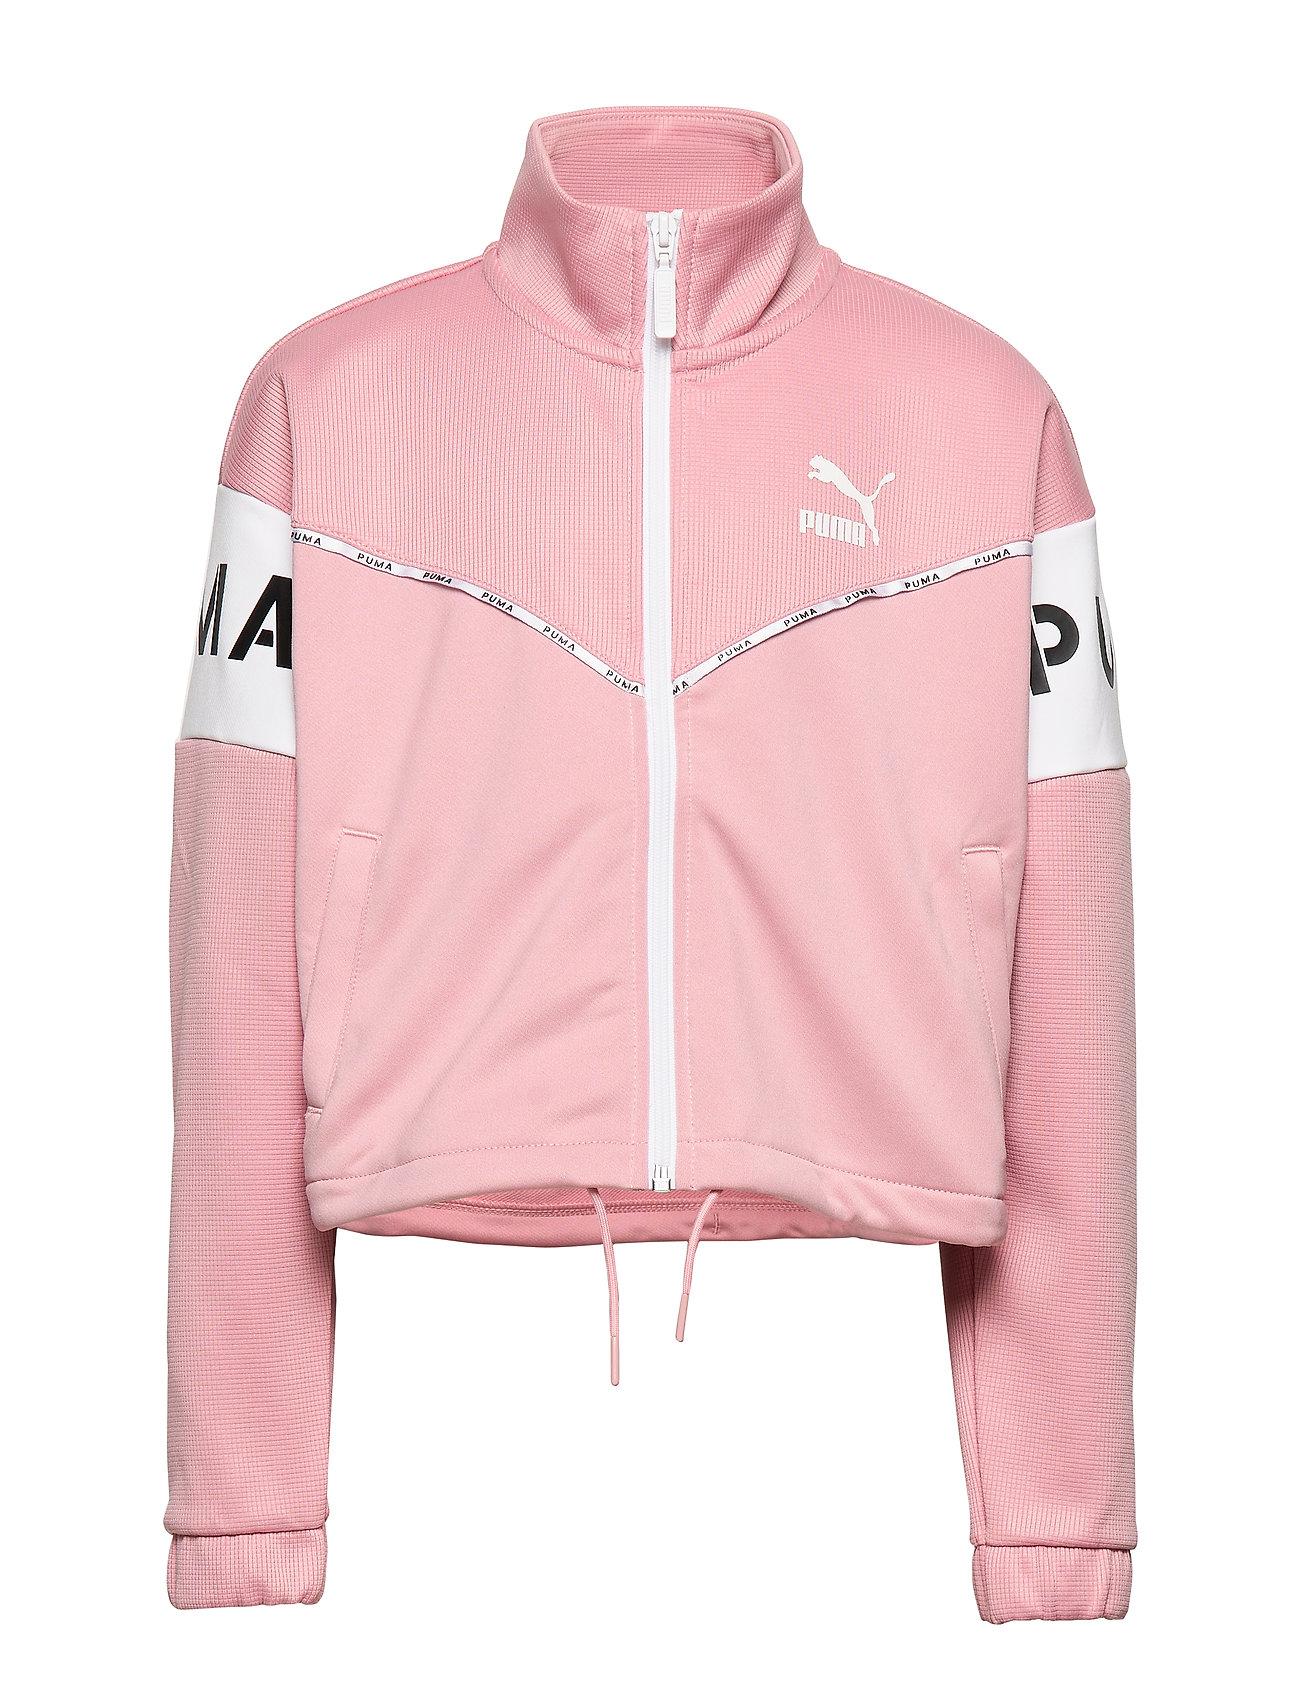 PUMA XTG Track Jacket G - BRIDAL ROSE